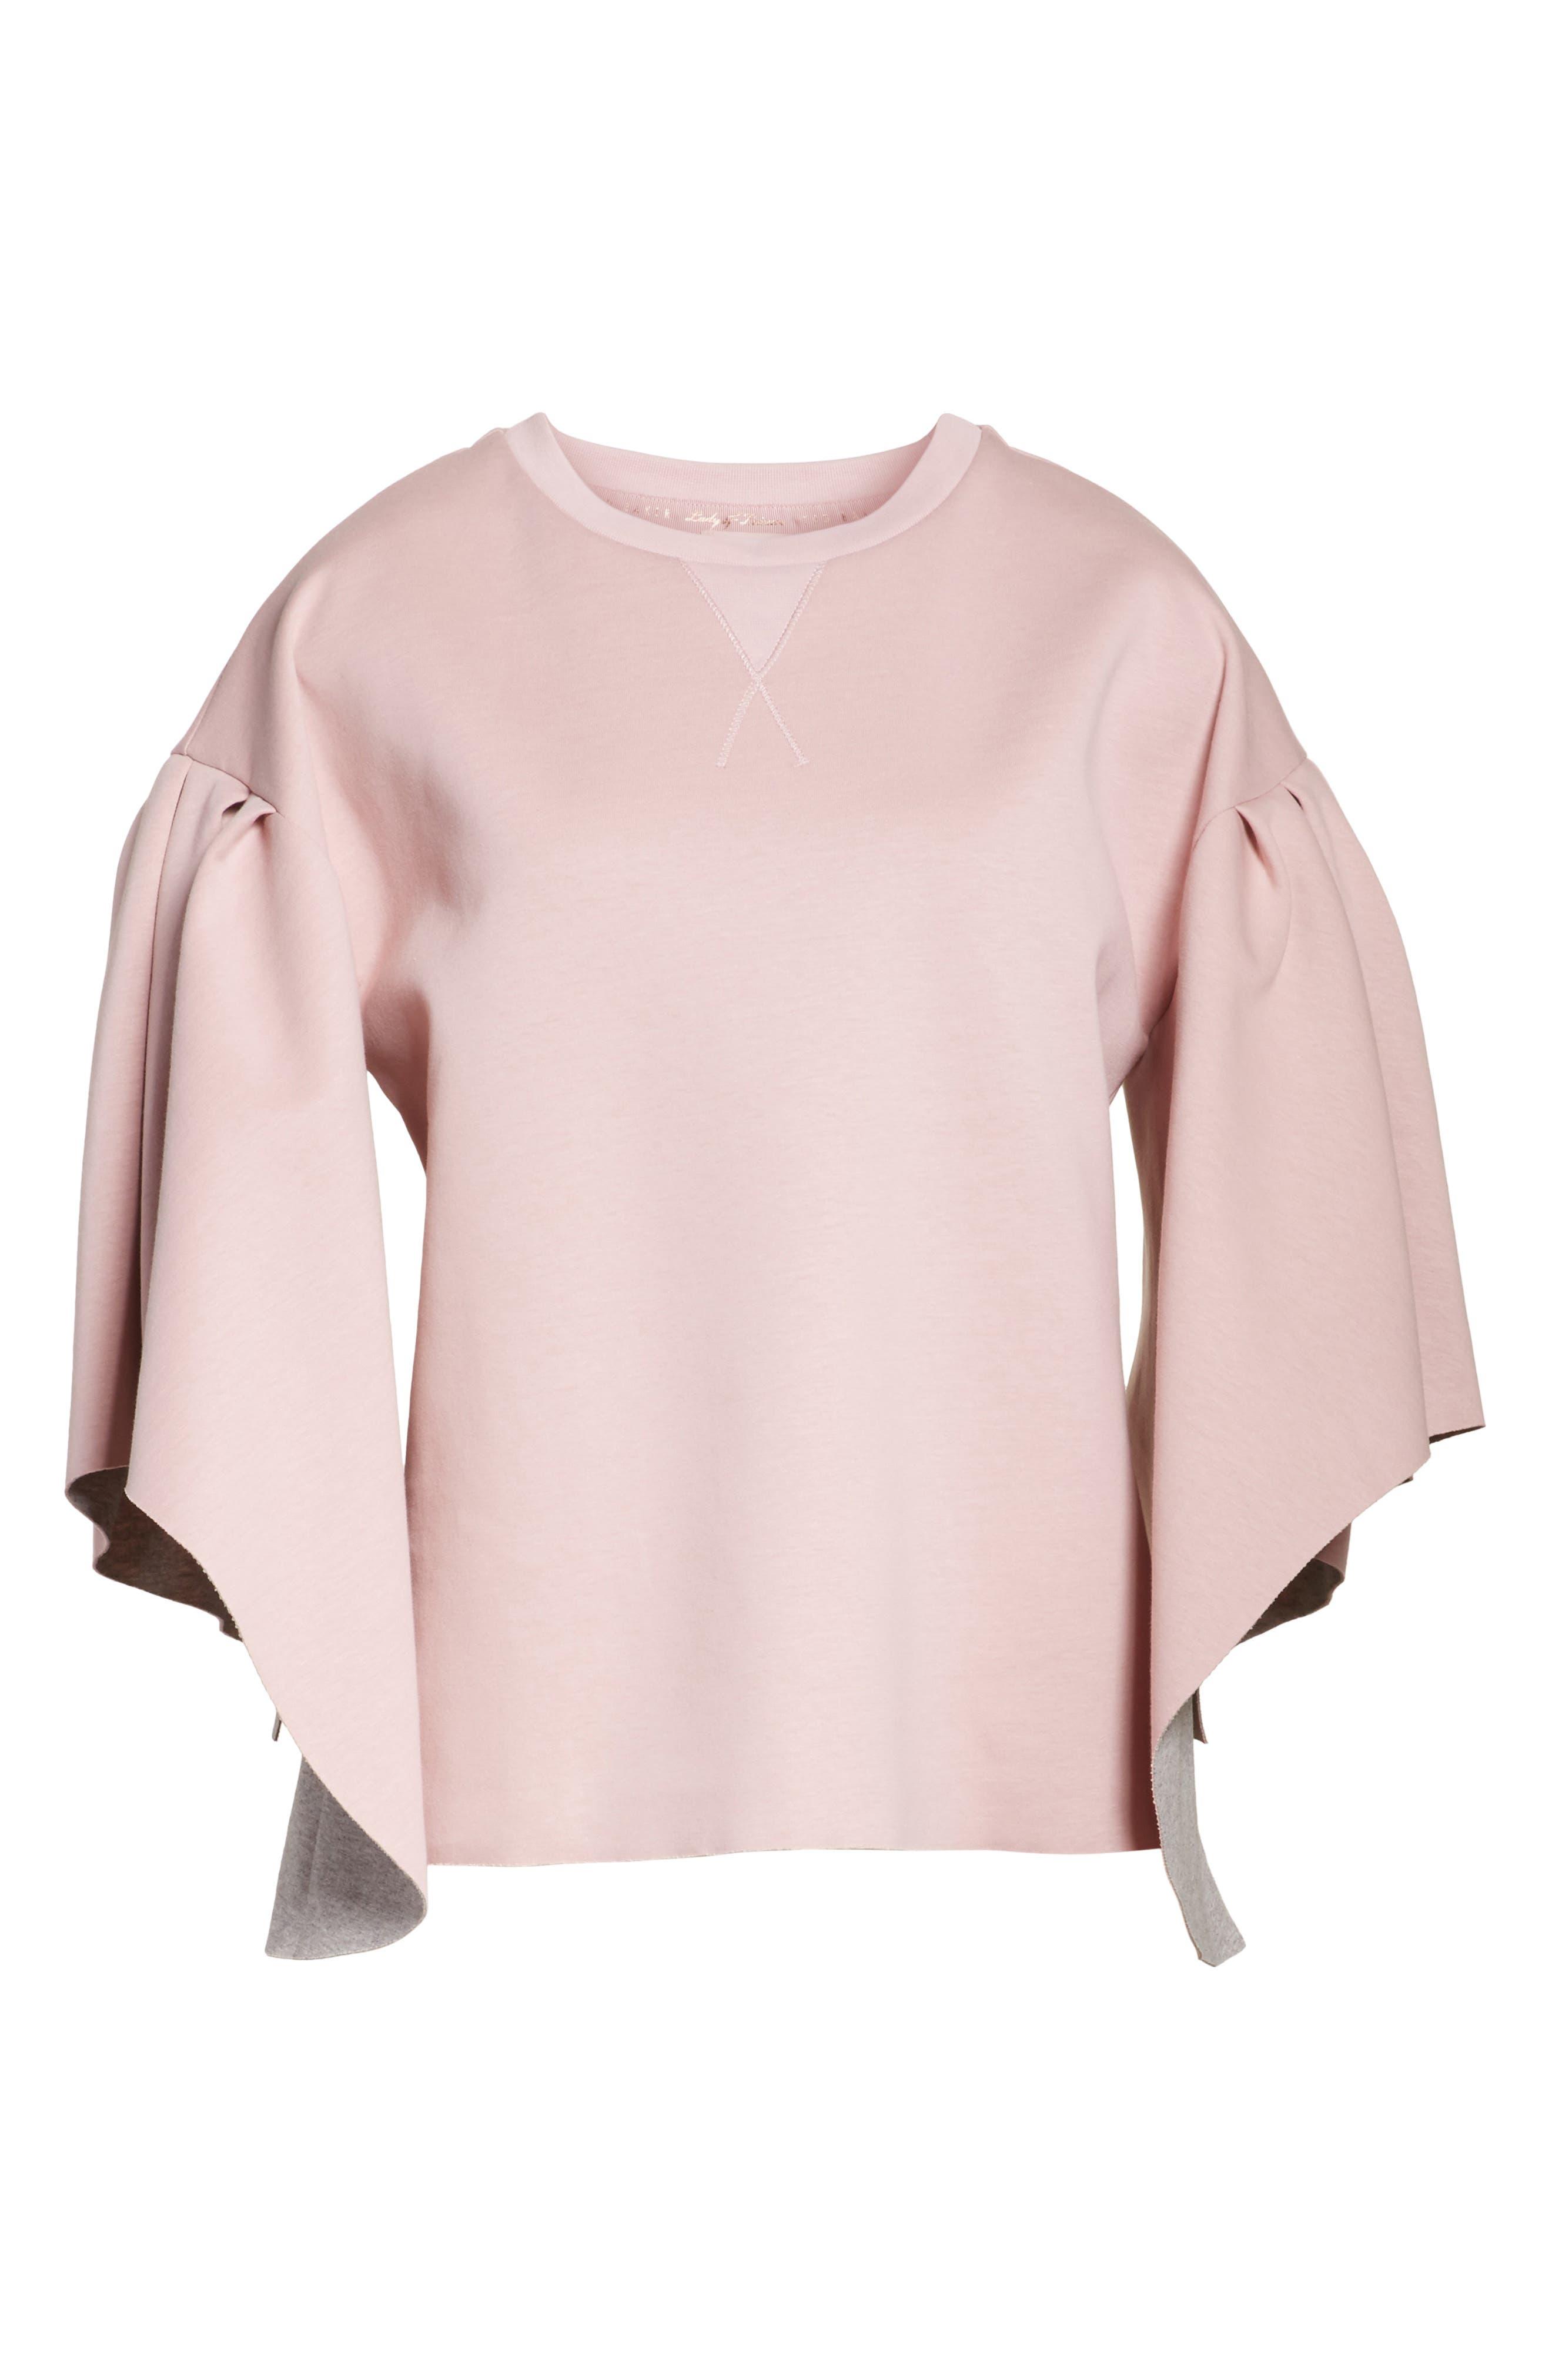 Orcher Full Sleeve Sweatshirt,                             Alternate thumbnail 6, color,                             Dusky Pink